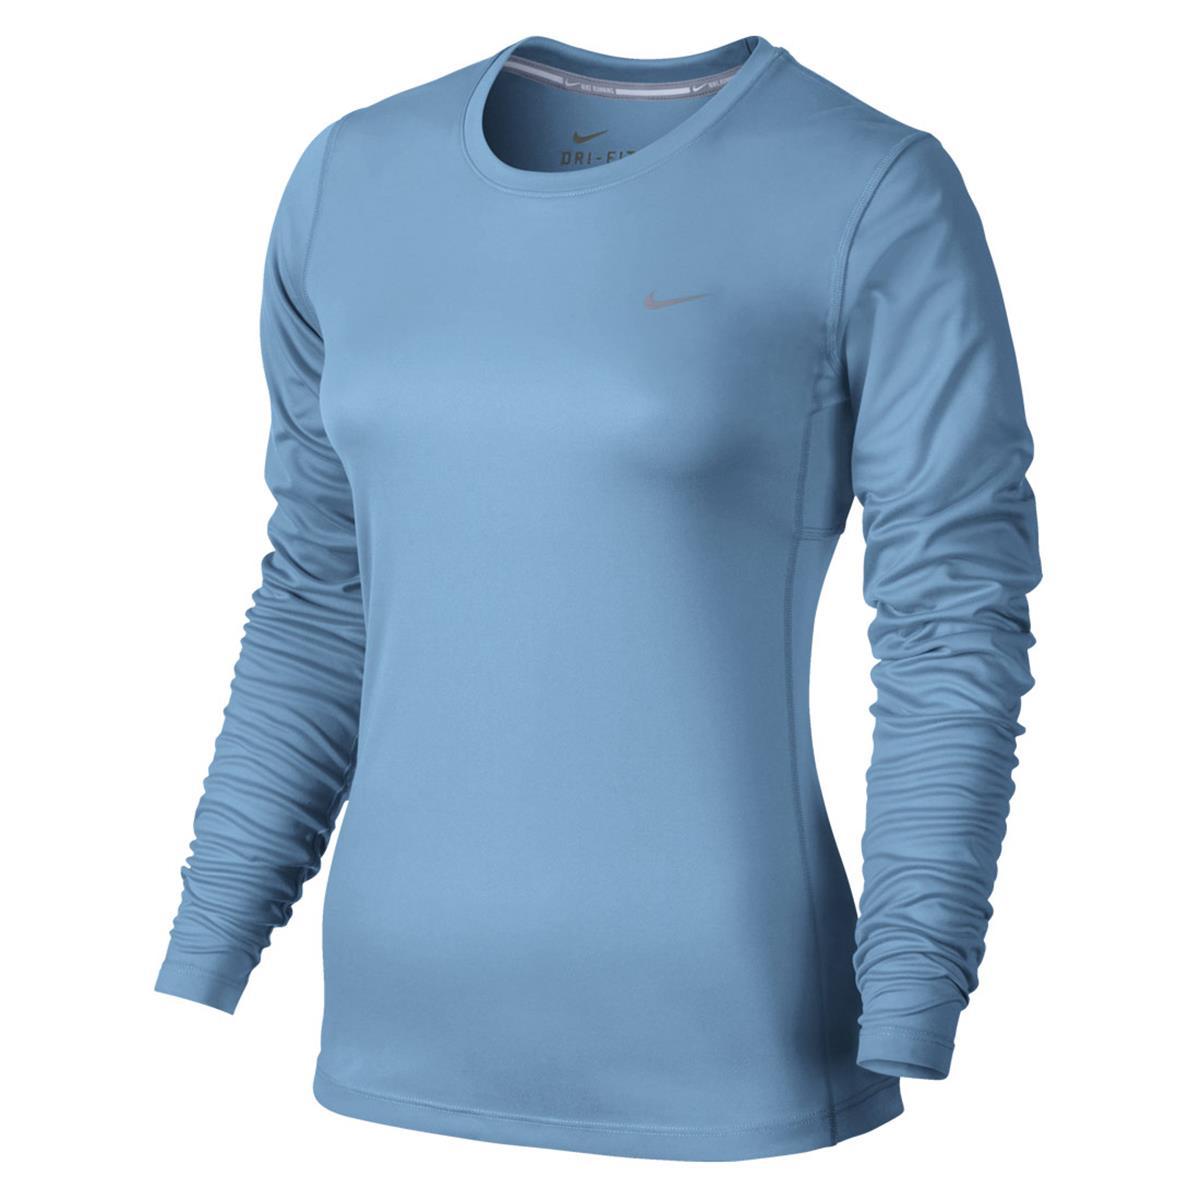 8a5789b4cbb Nike Dri Fit Long Sleeve Shirts Womens – EDGE Engineering and ...